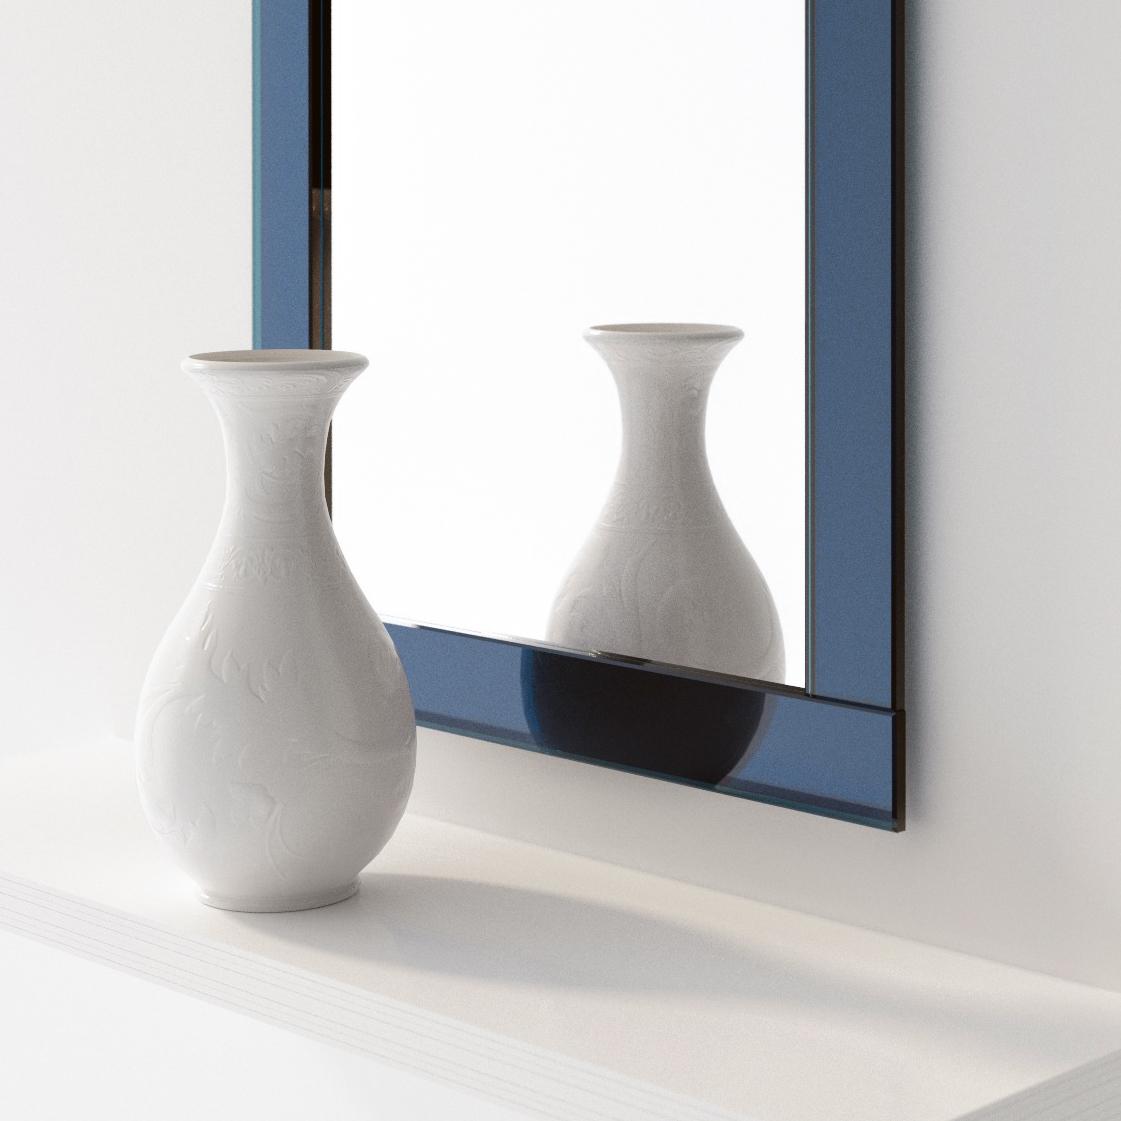 Deco wall mirror with blueglass mirror photographedat Color & Mirror studio in Detroit.